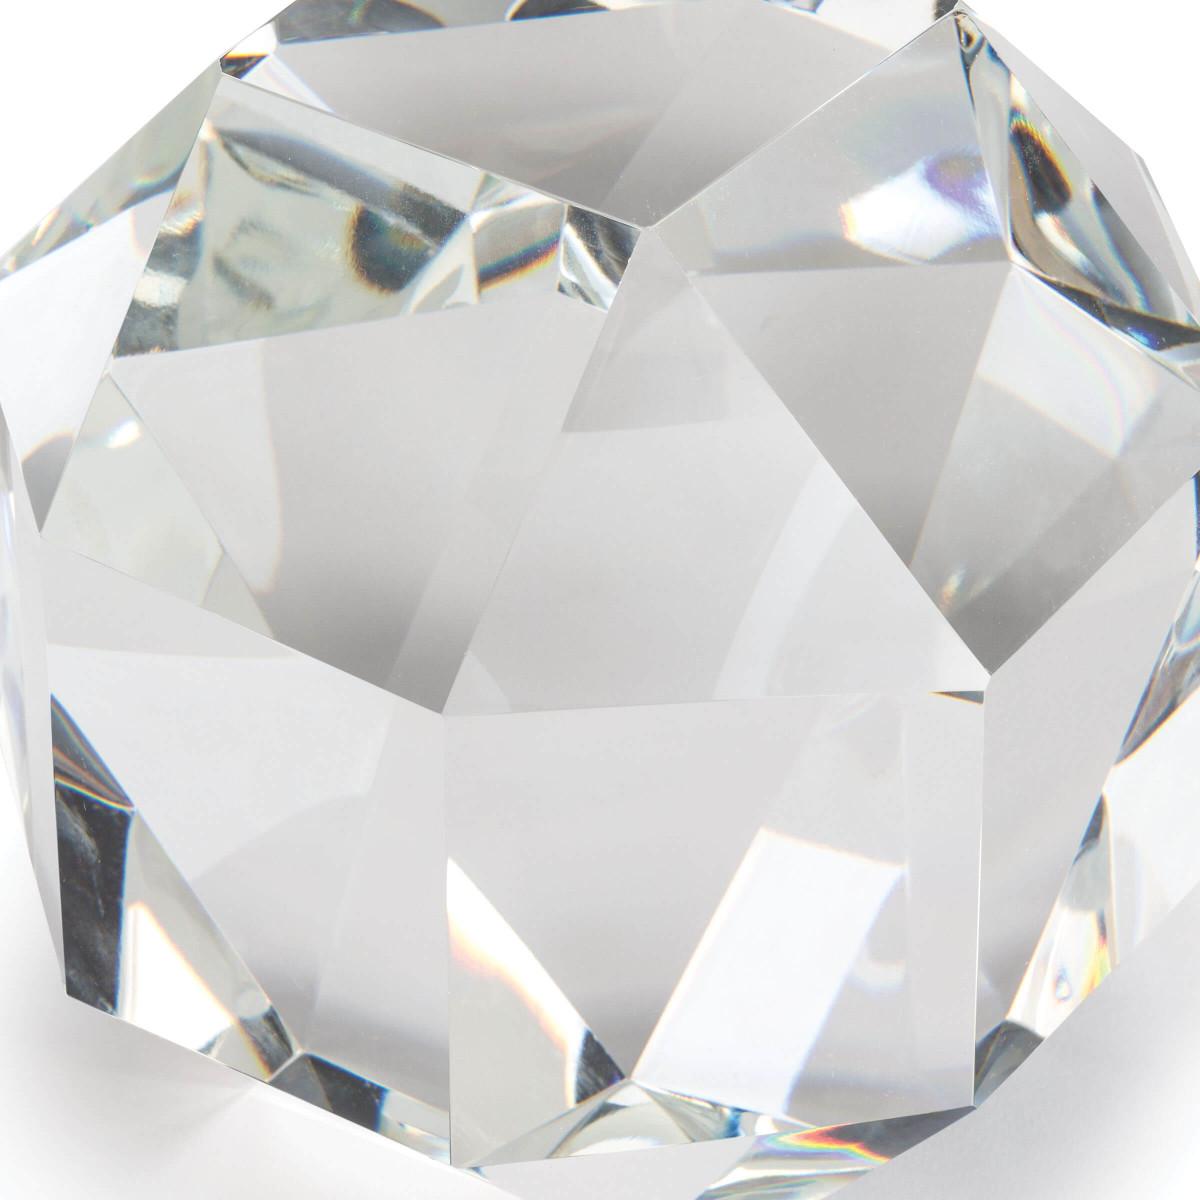 Fonda Facet Crystal Objects | No. 2